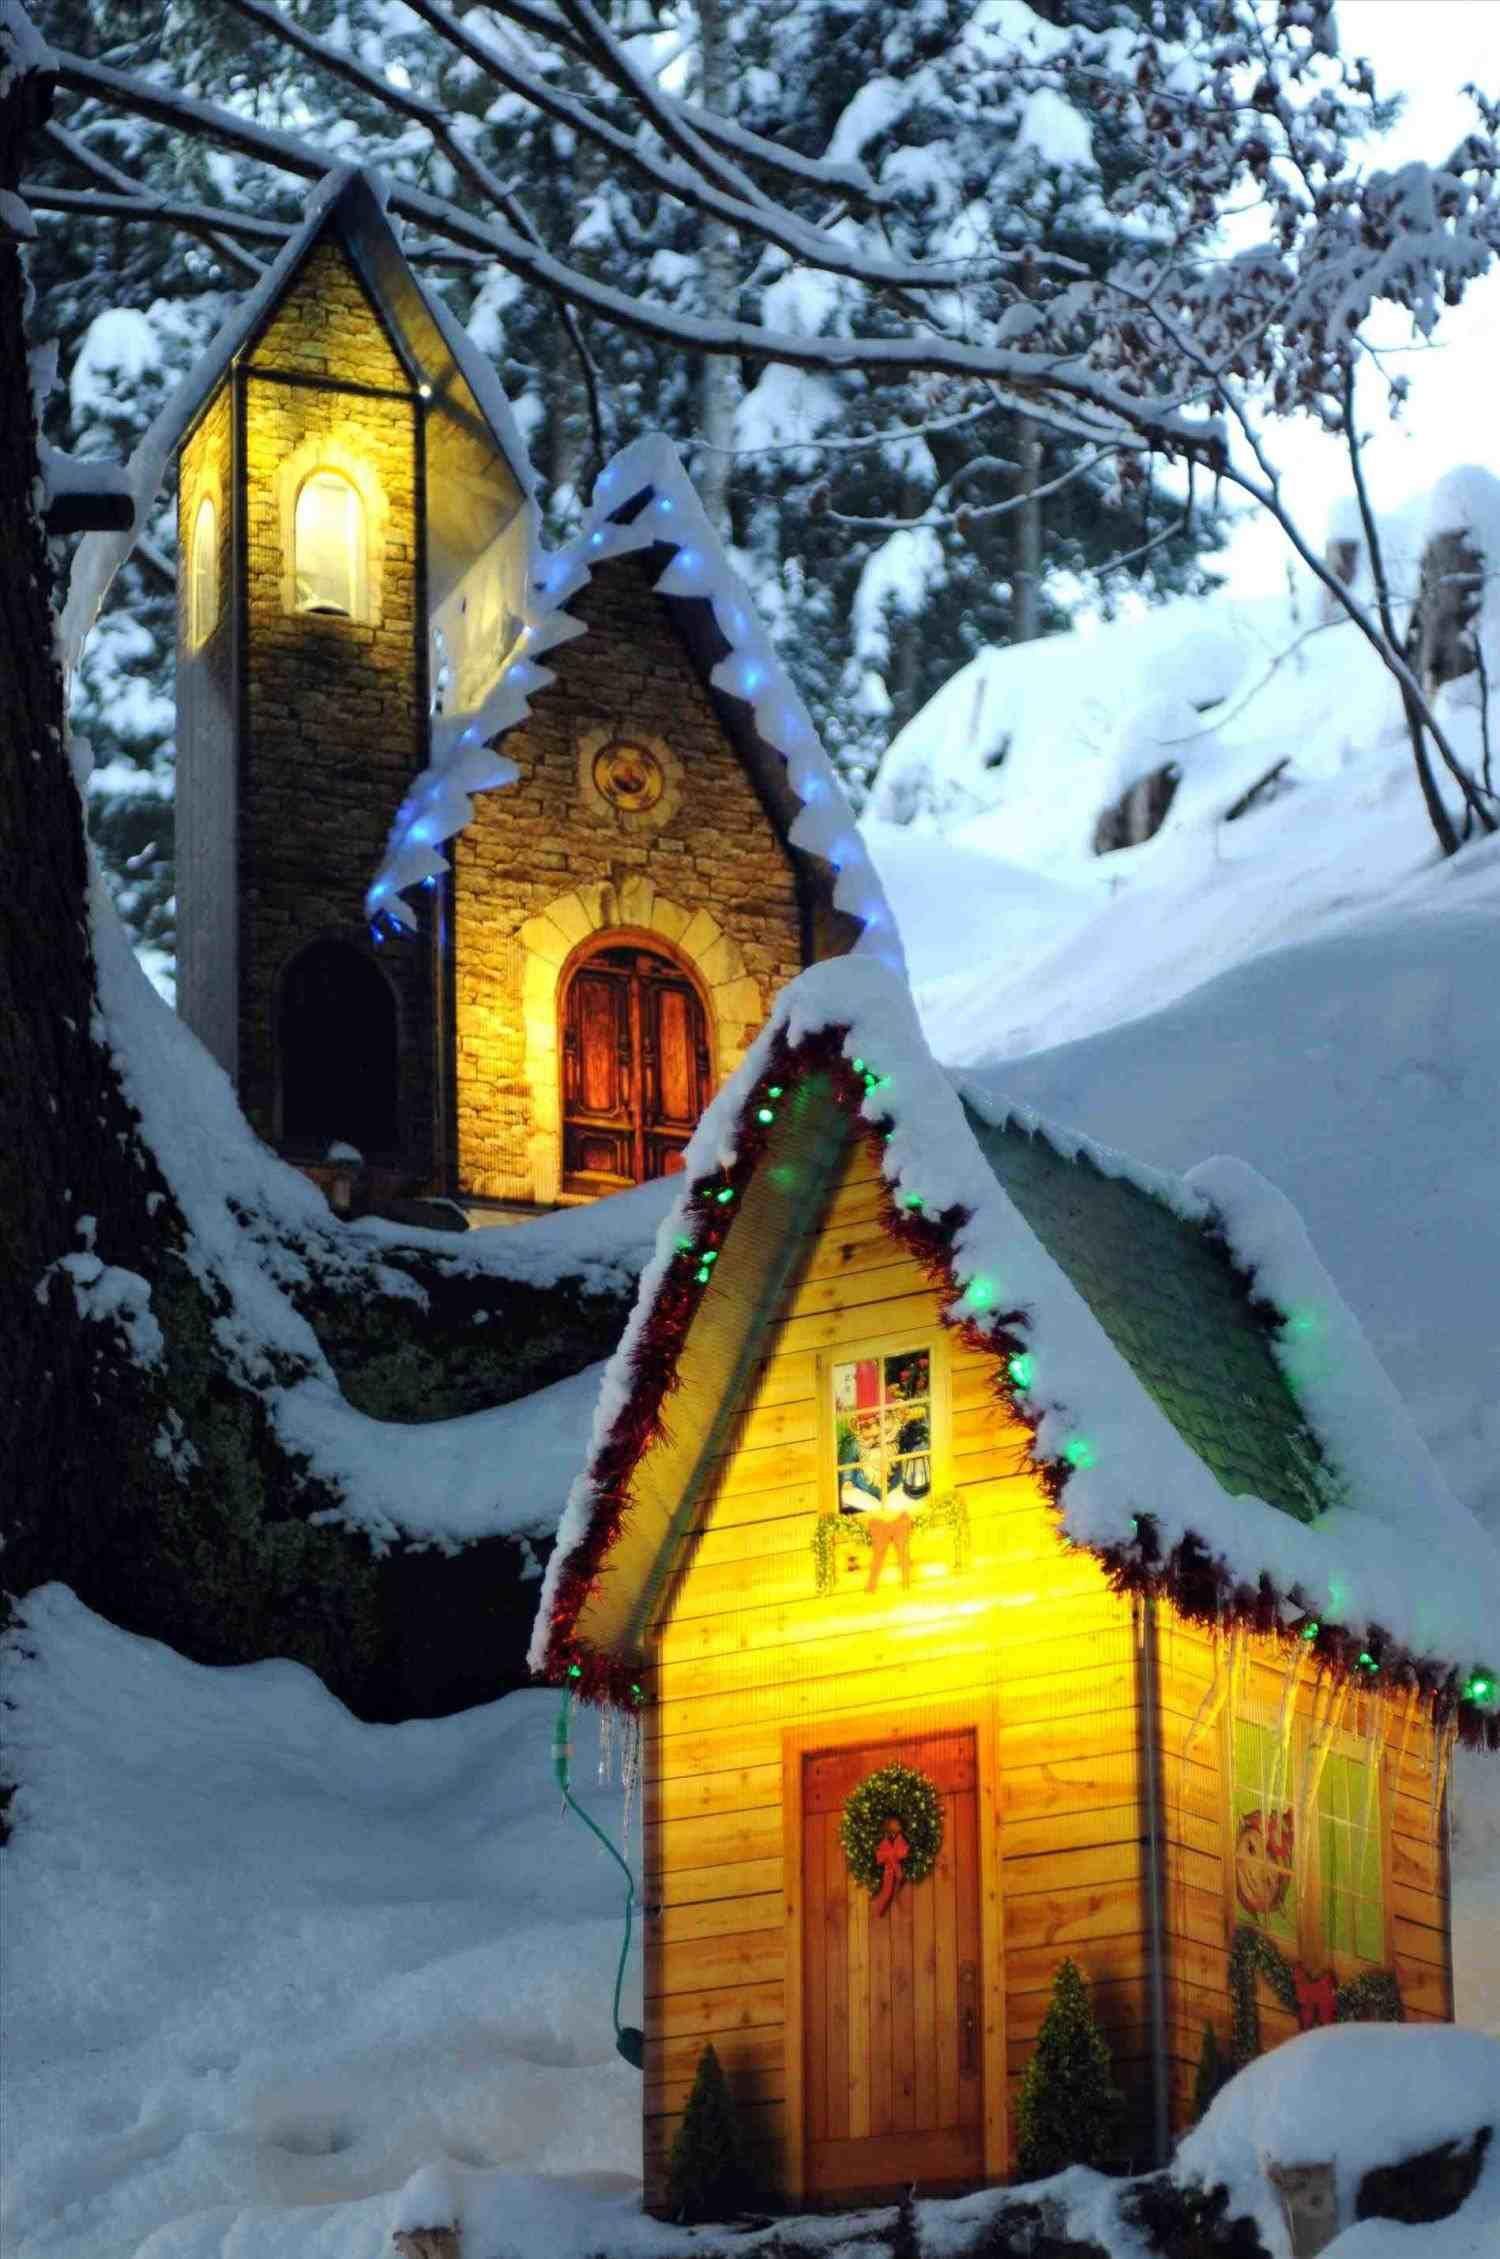 New Post norman rockwell christmas village | xmast | Pinterest ...